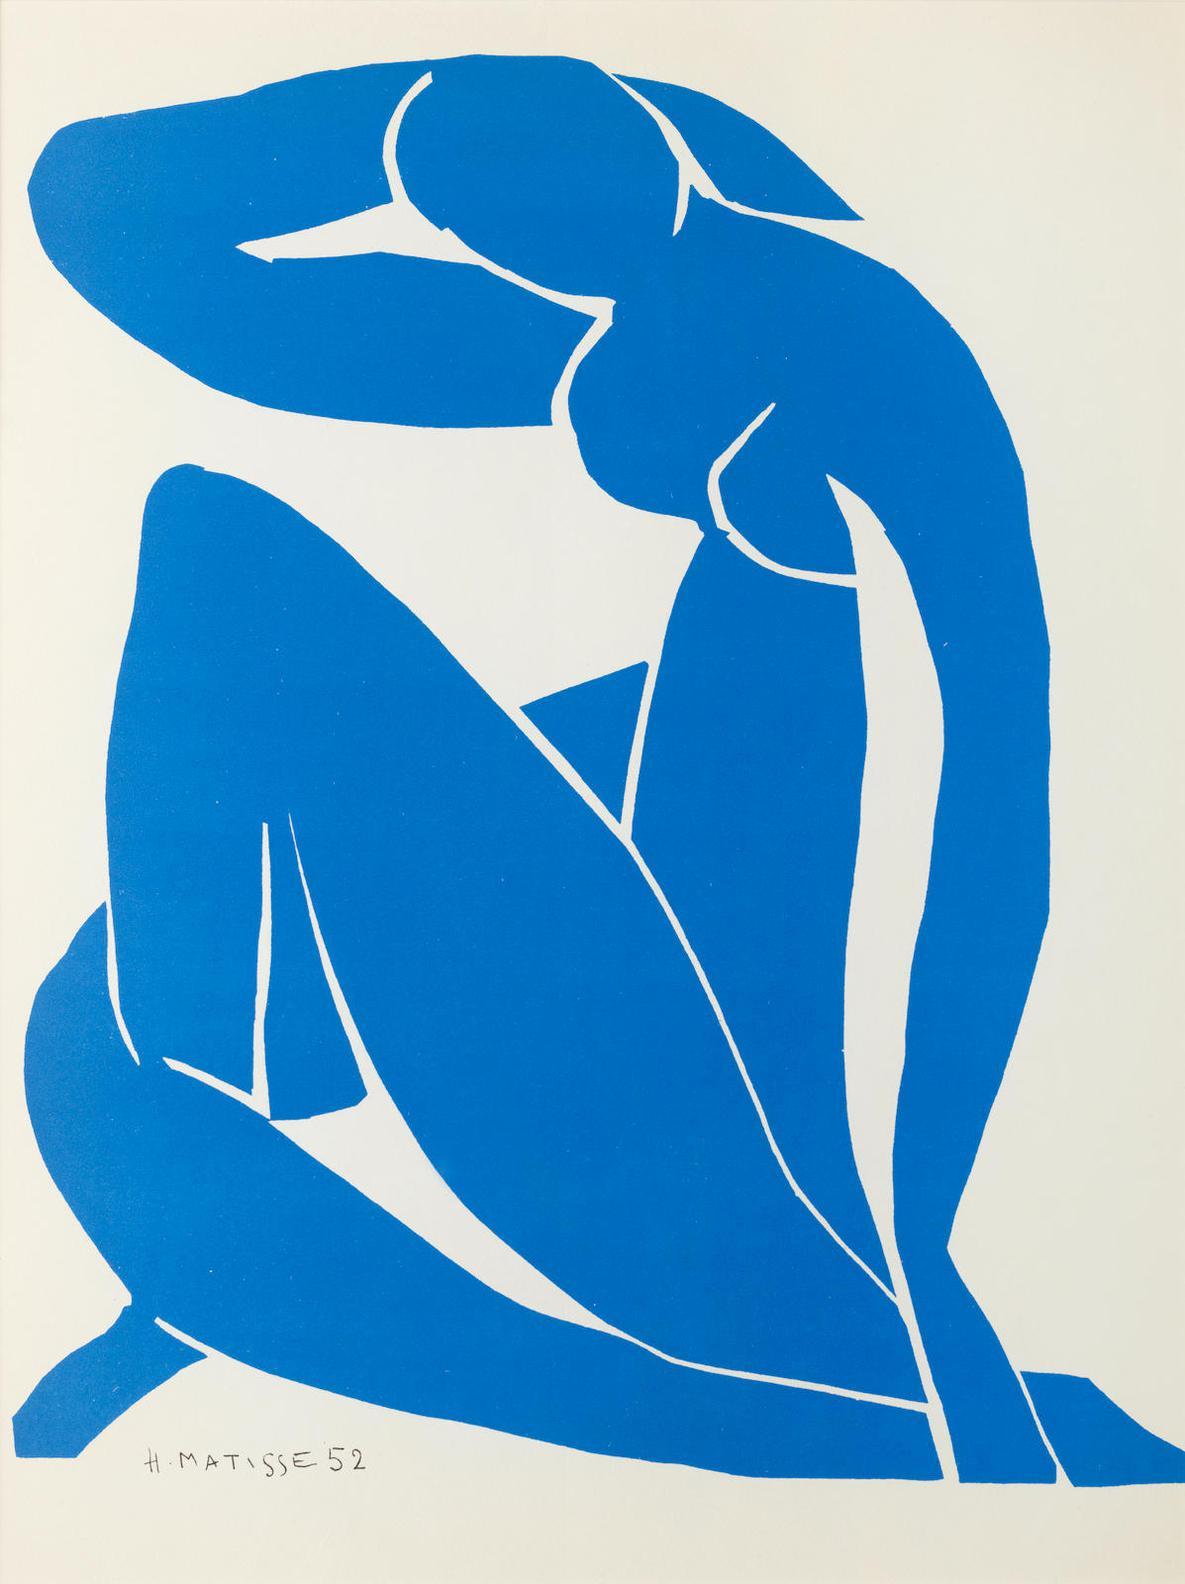 Henri Matisse-After Henri Matisse - Five Blue Nudes, From Verve Nos.35-36: Les Dernieres Oeuvres De Matisse 1950-54-1954